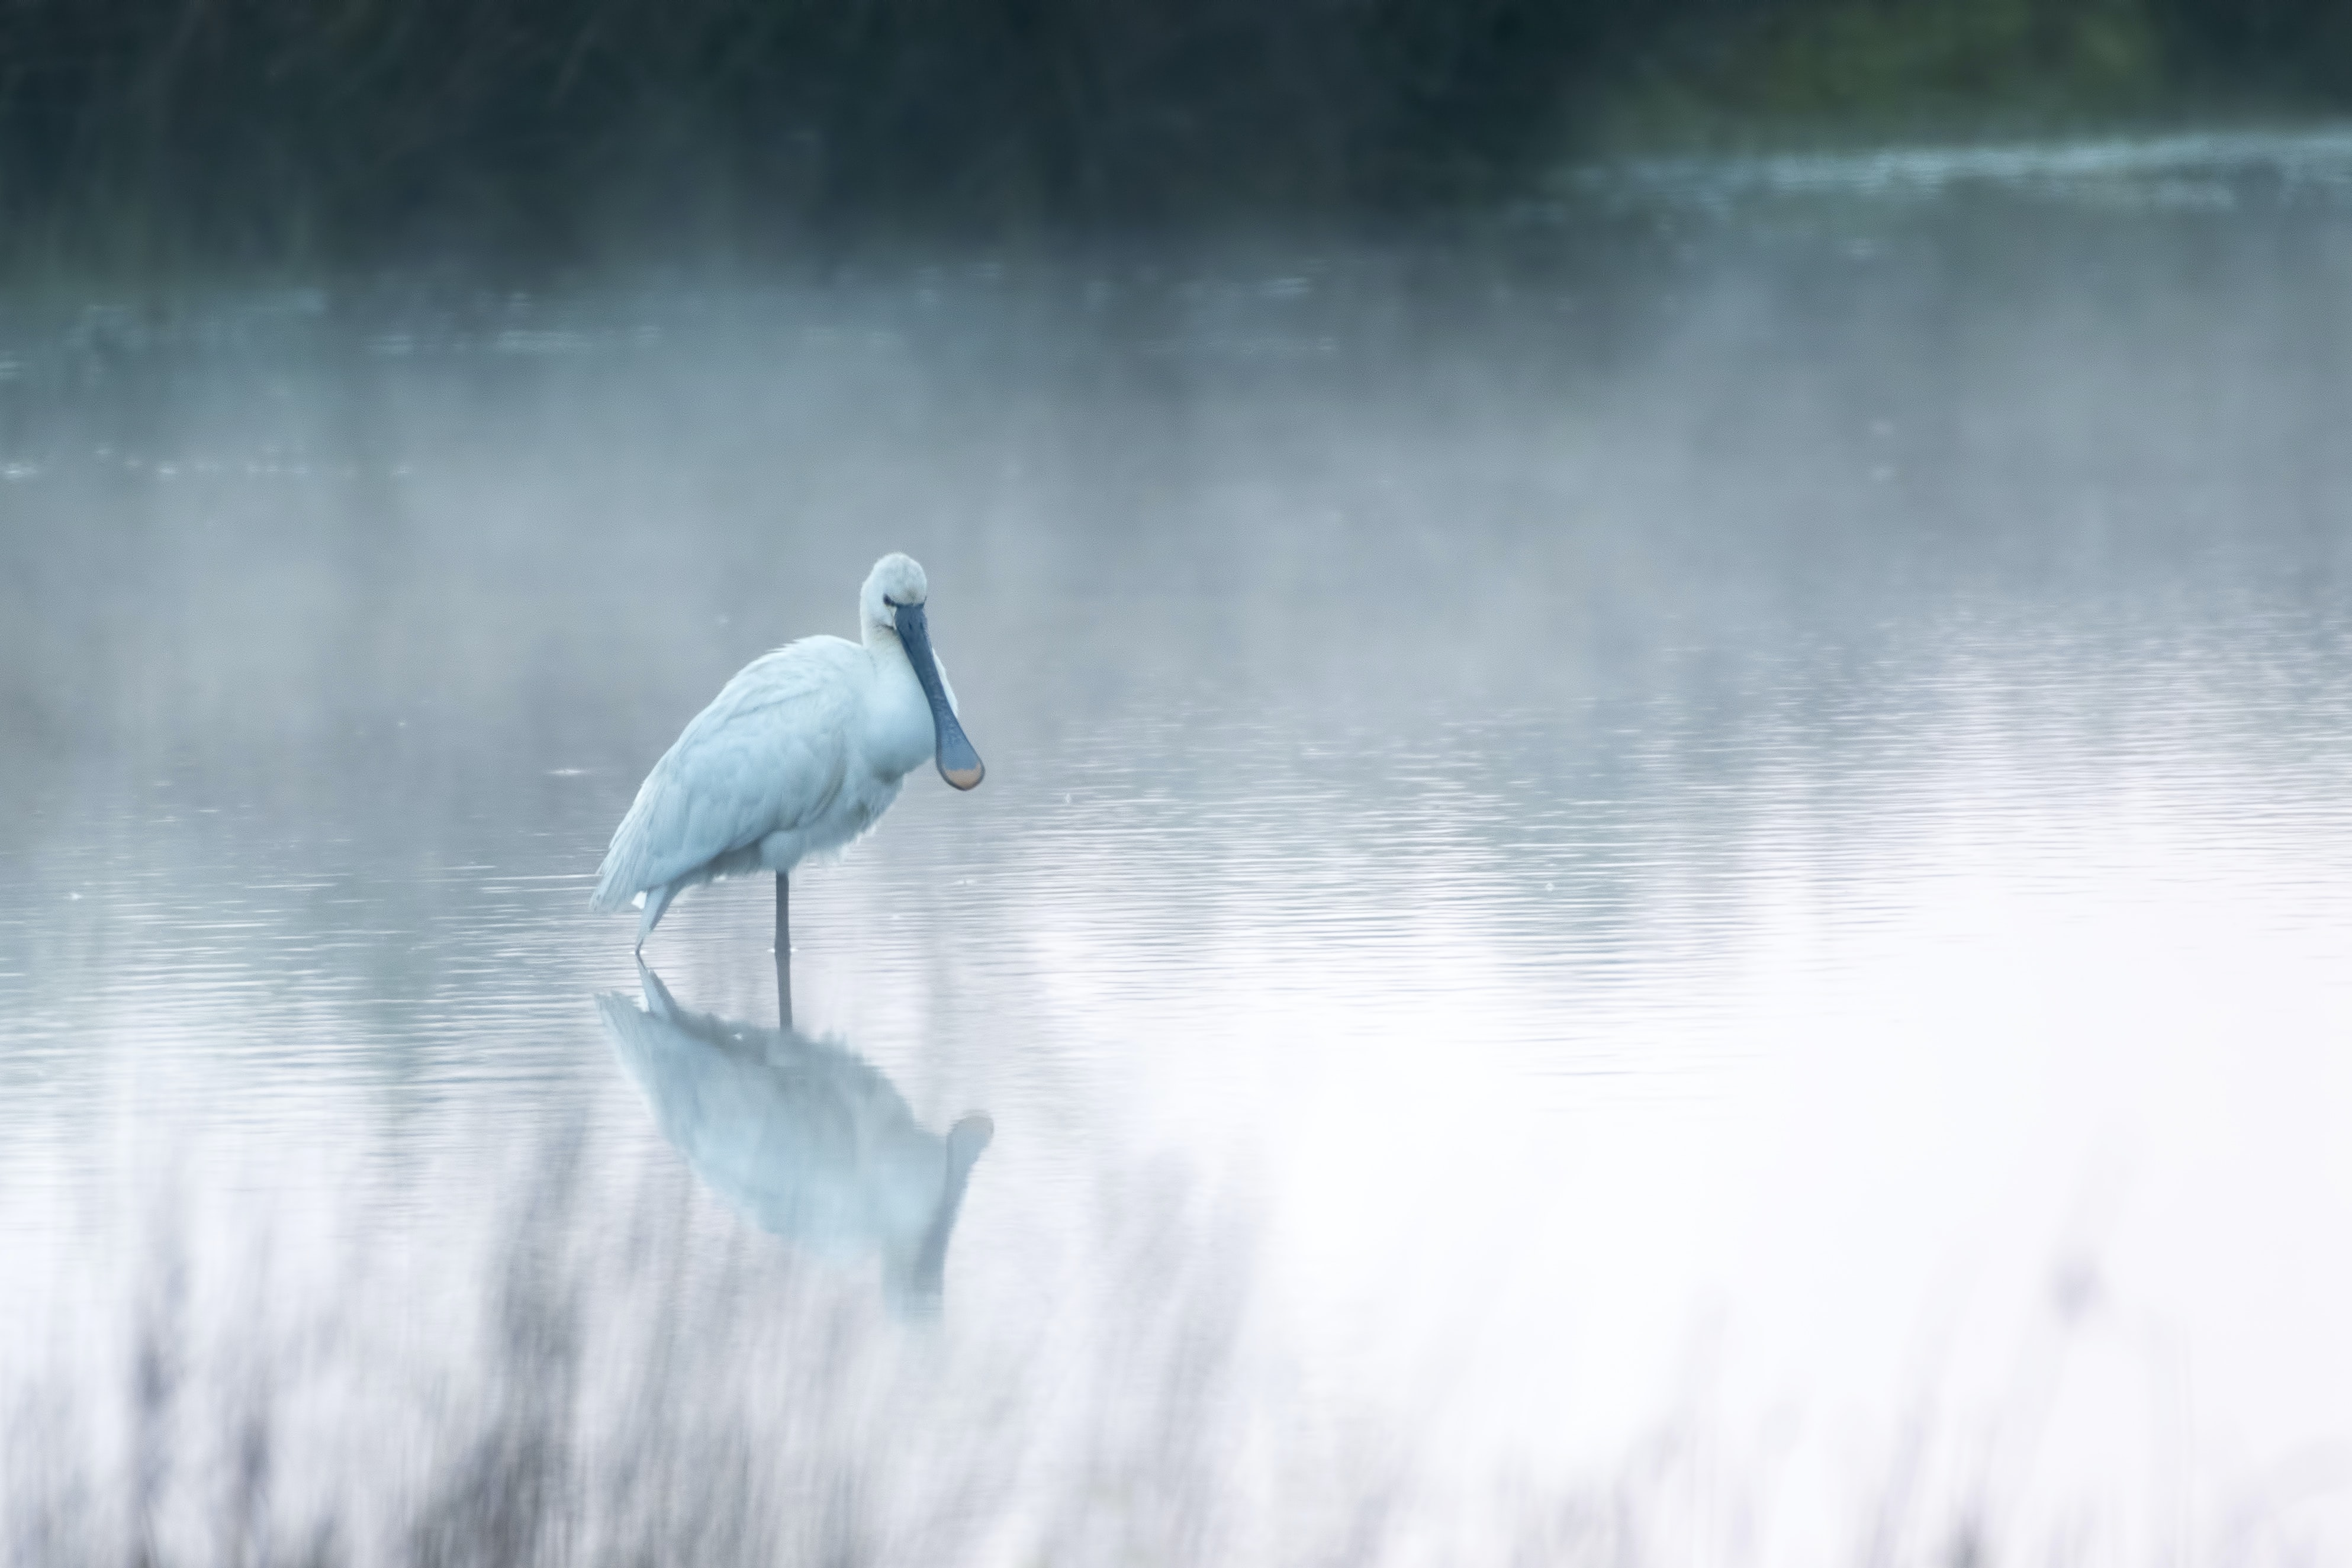 bird walking on shallow body of water during daytime